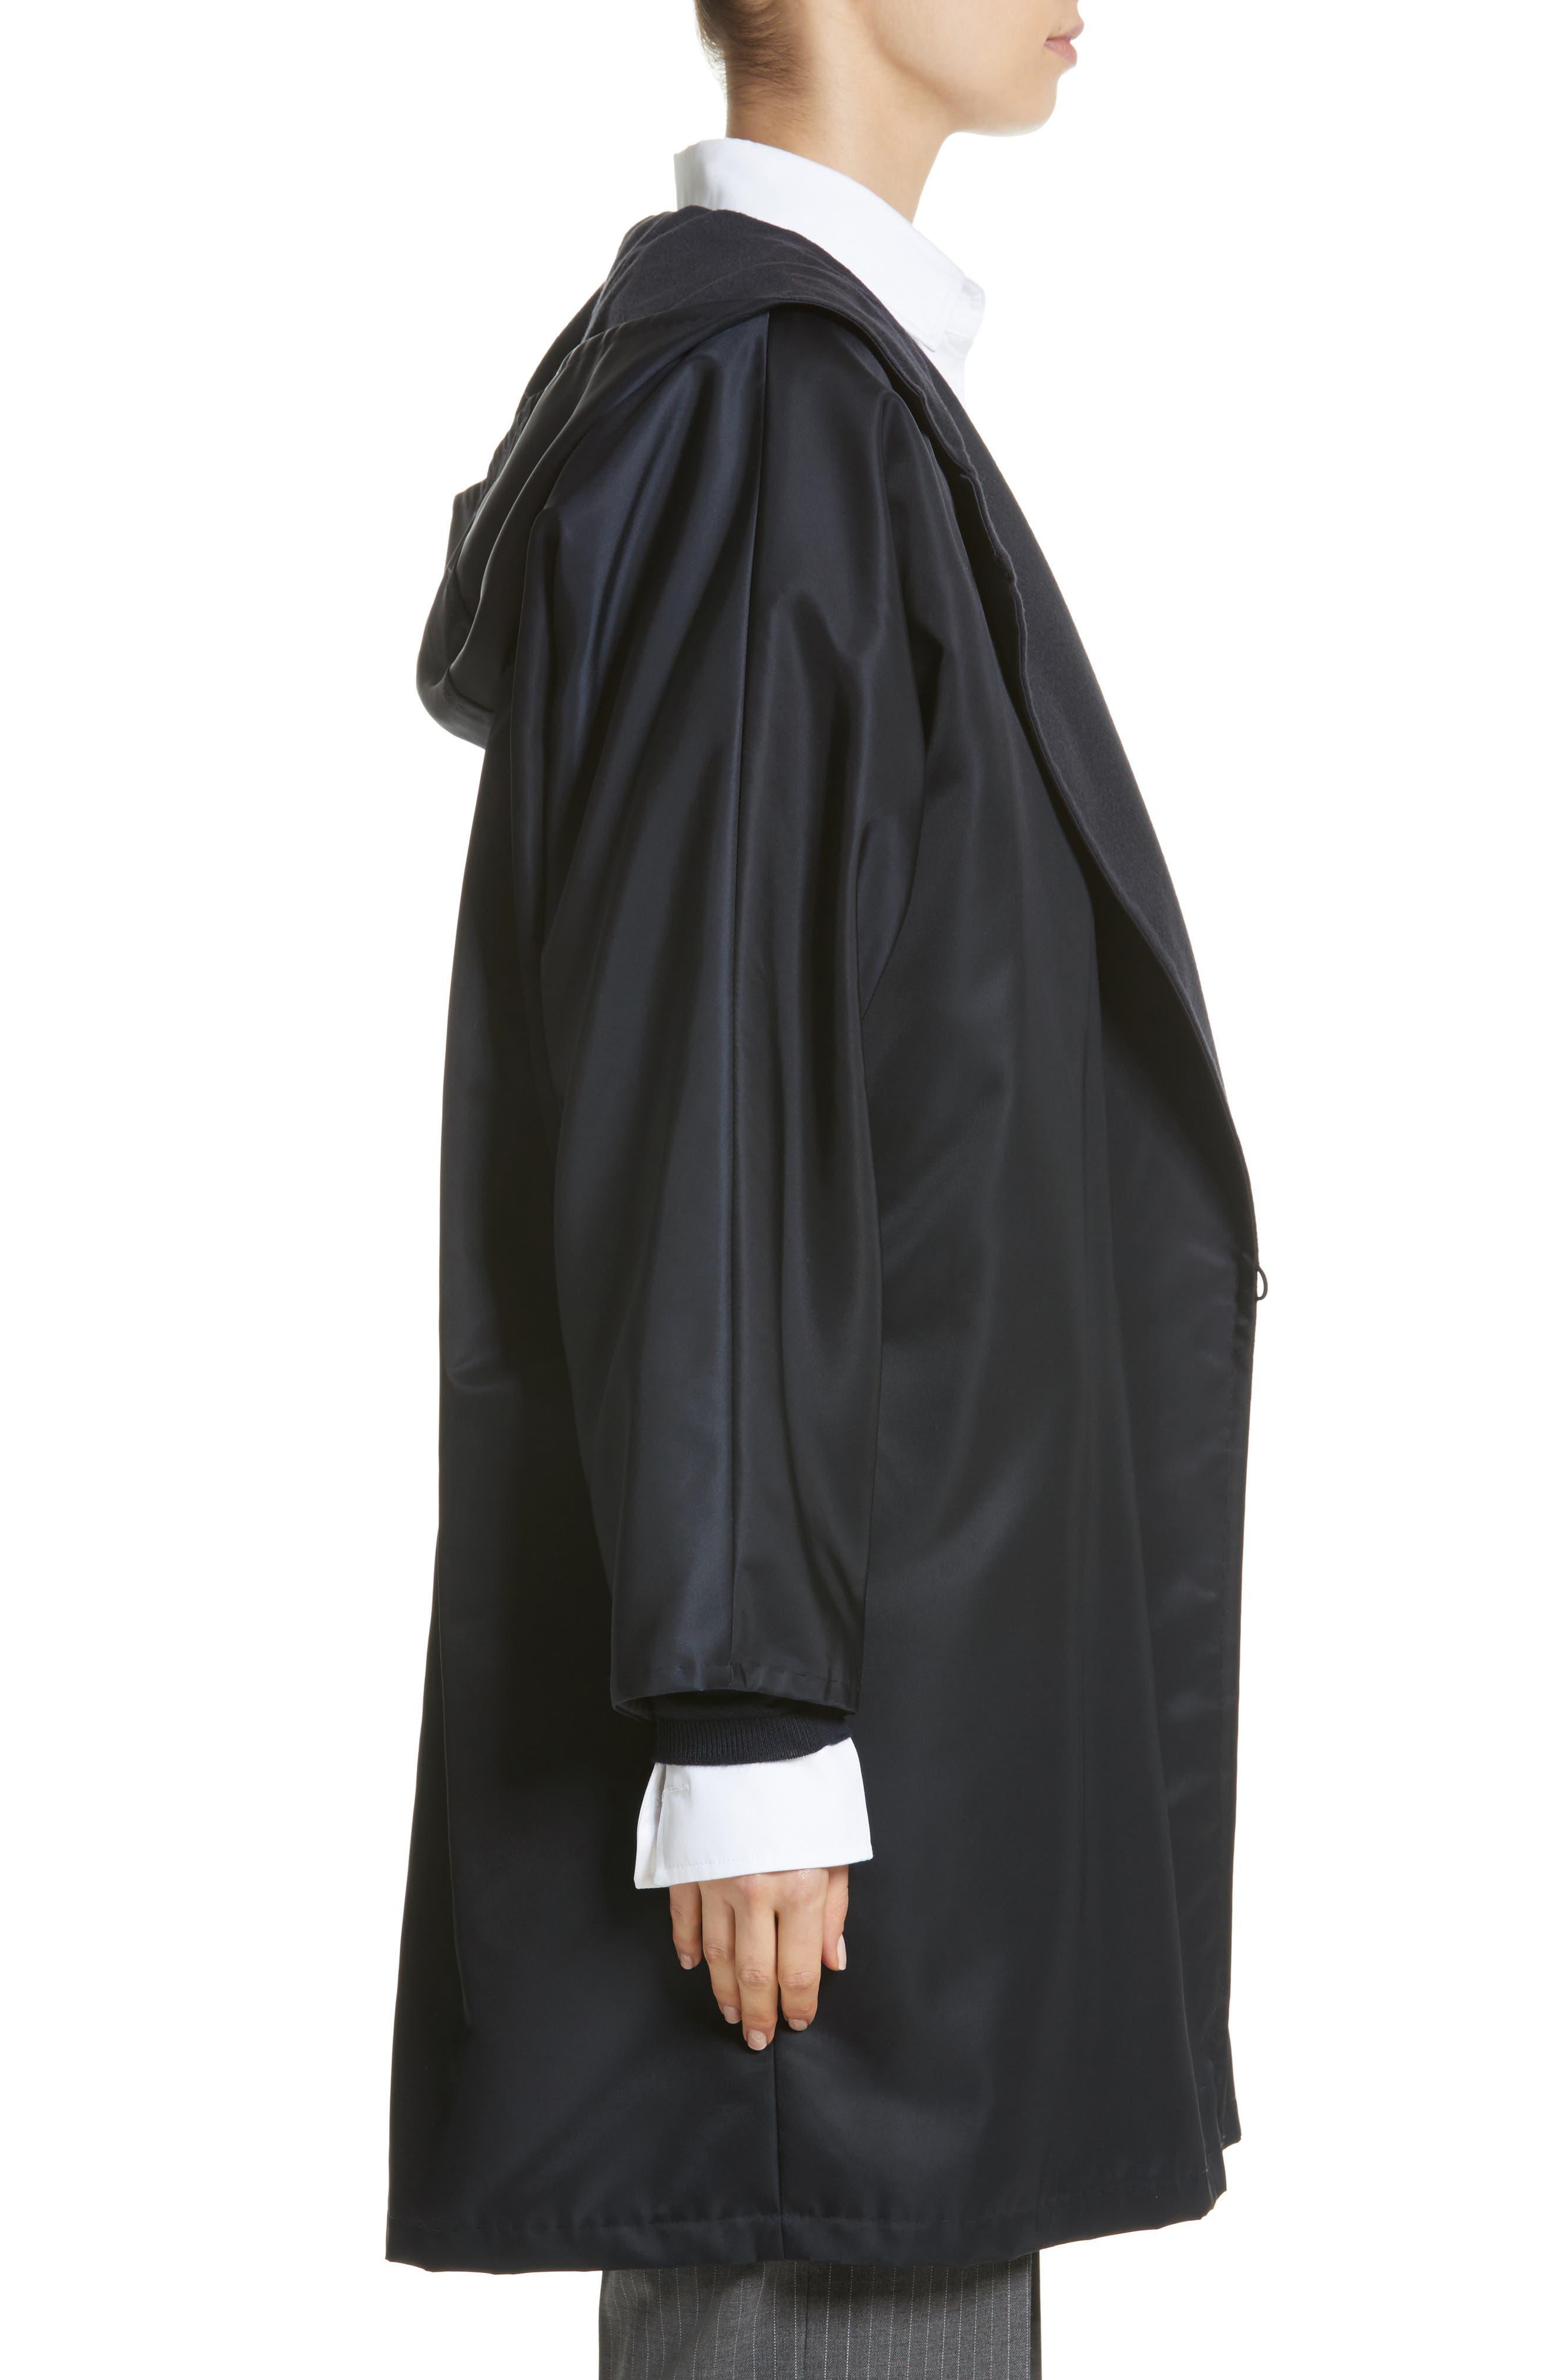 Jacopo Reversible Hooded Coat,                             Alternate thumbnail 4, color,                             411